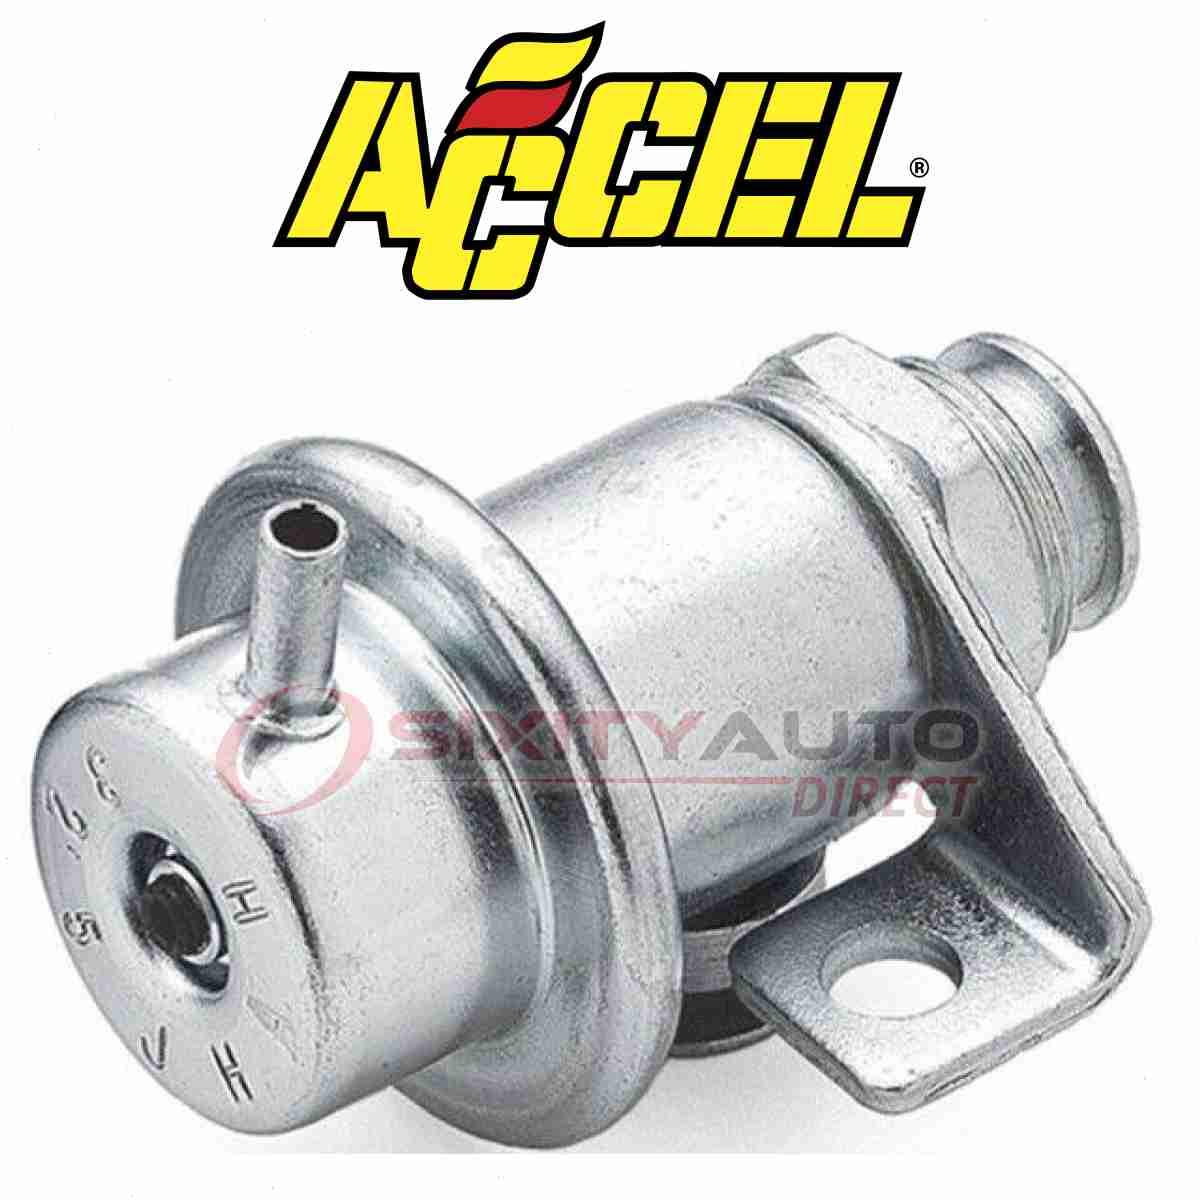 Delphi Fuel Injection Pressure Regulator for 1996-2000 Chevrolet C2500 5.7L ut